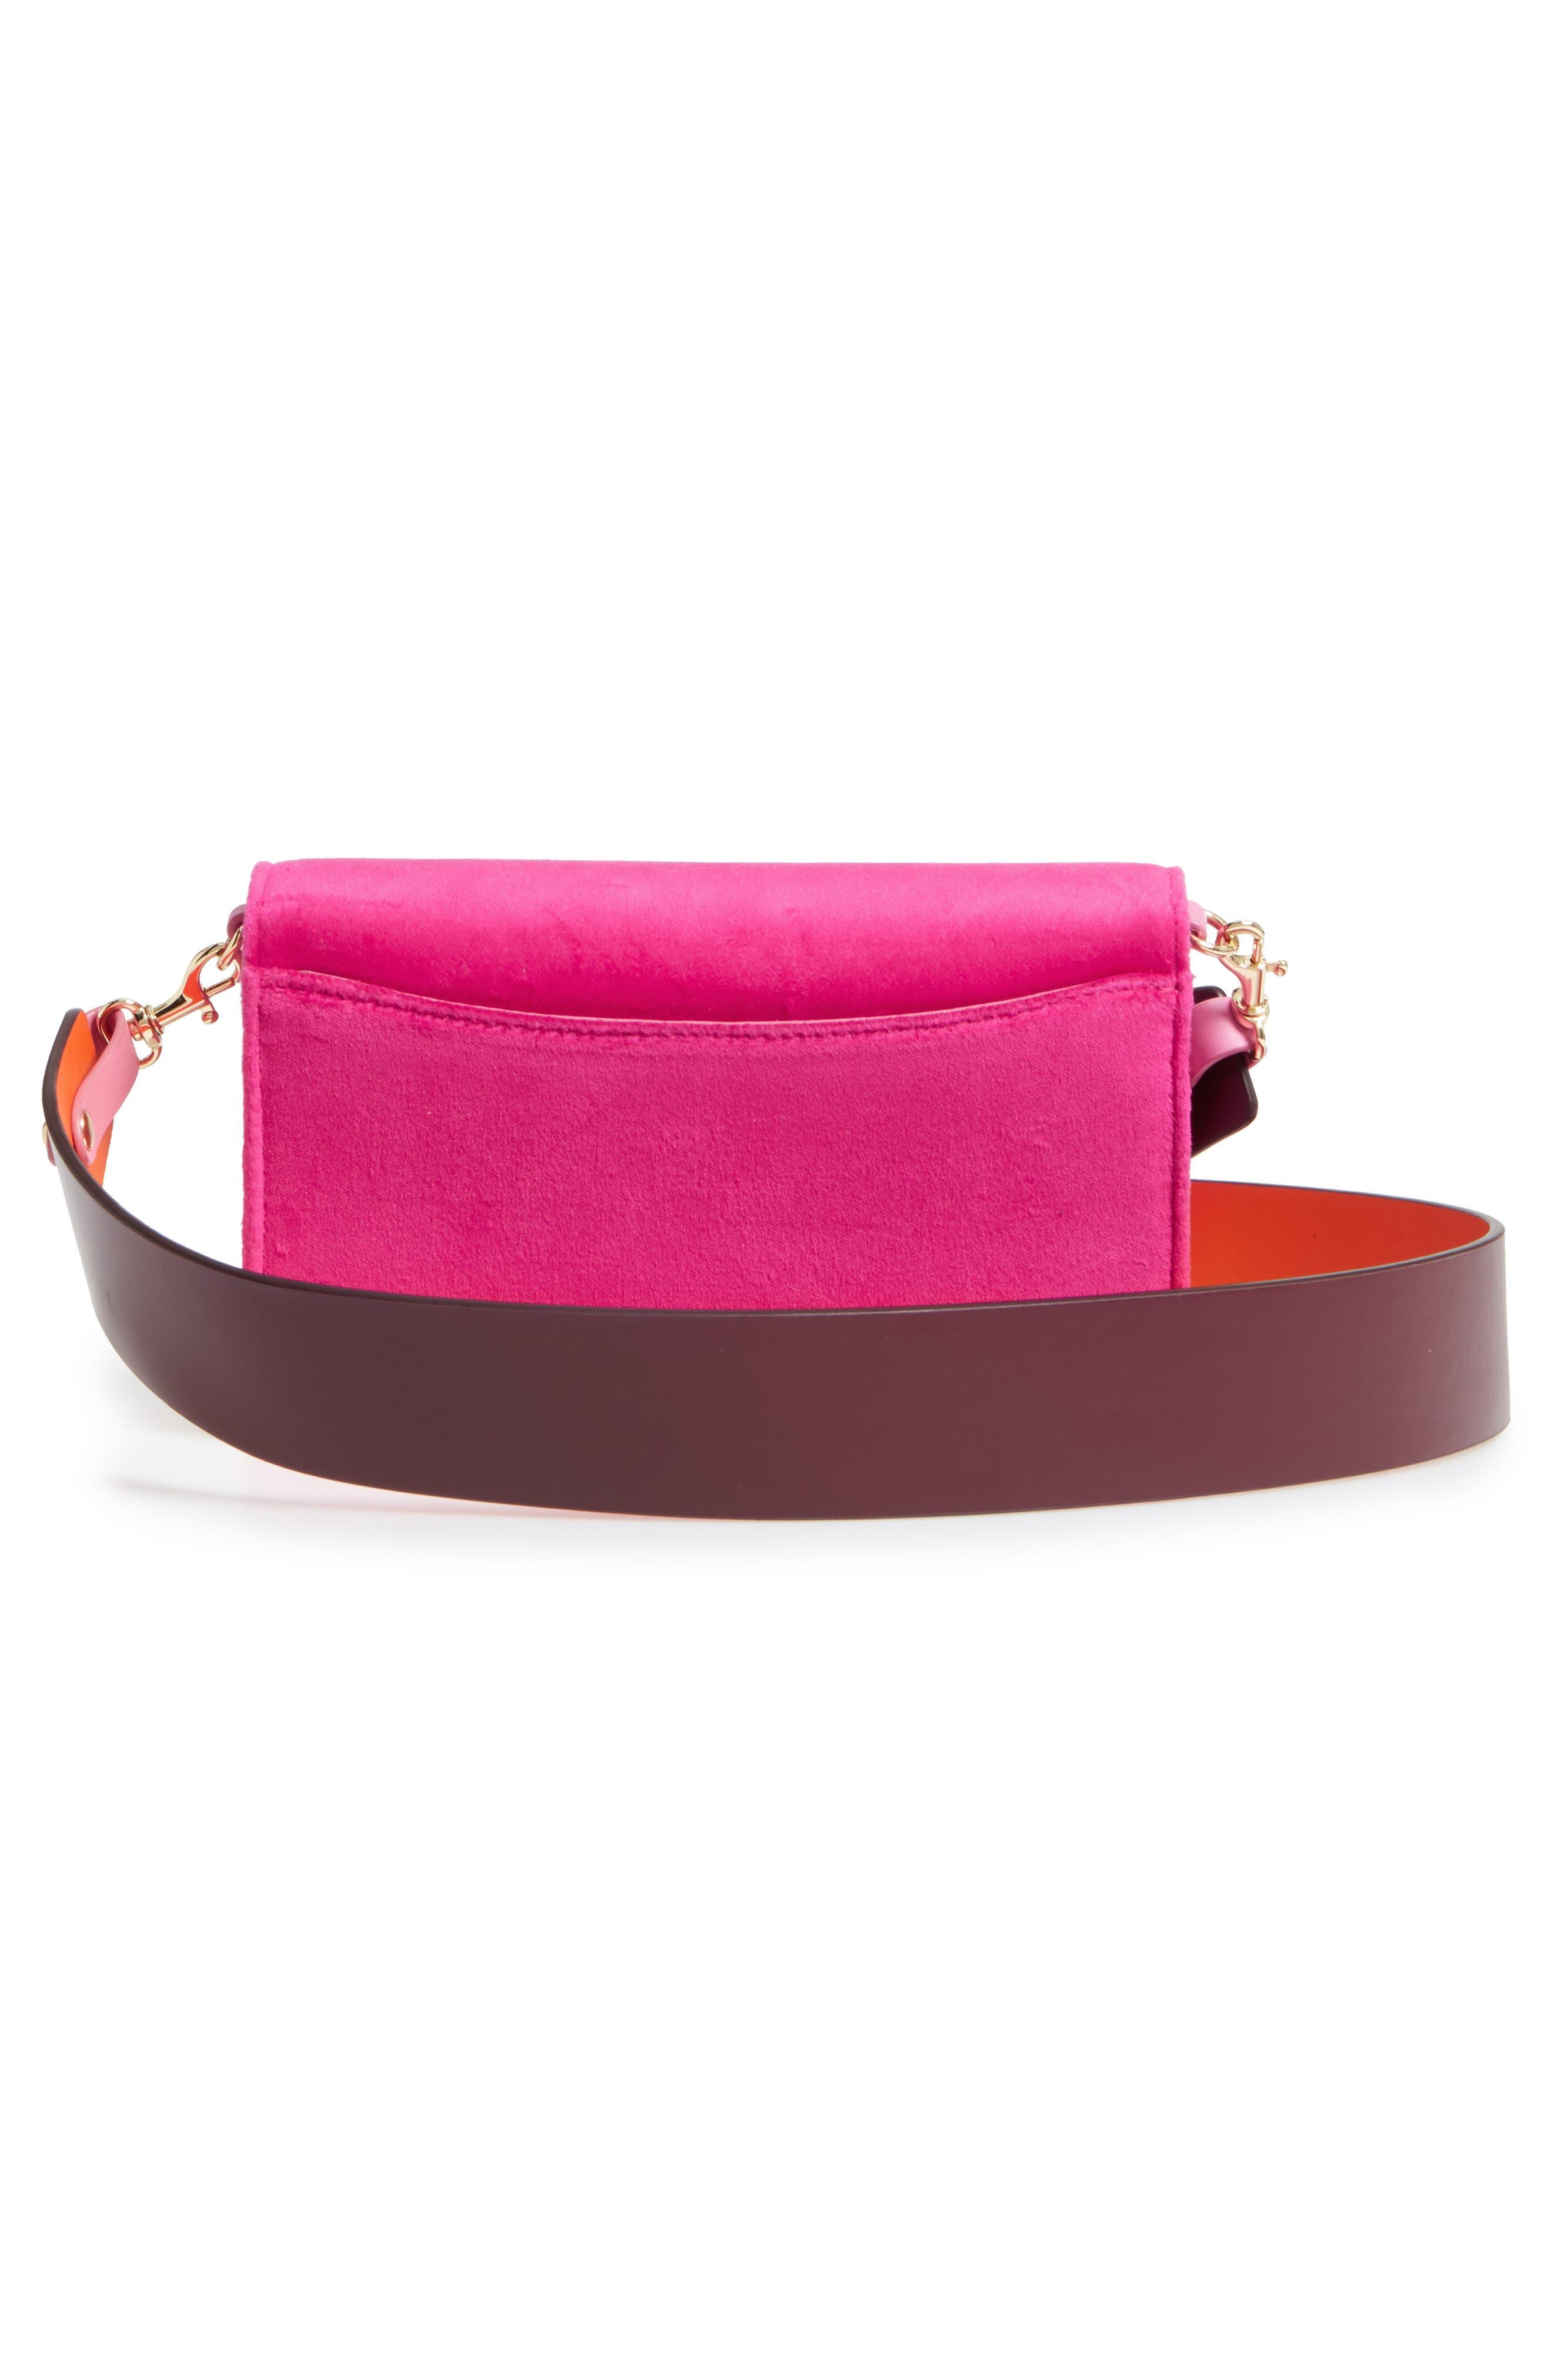 Soirée Velvet Convertible Crossbody Bag,                             Alternate thumbnail 3, color,                             Pink Azalea